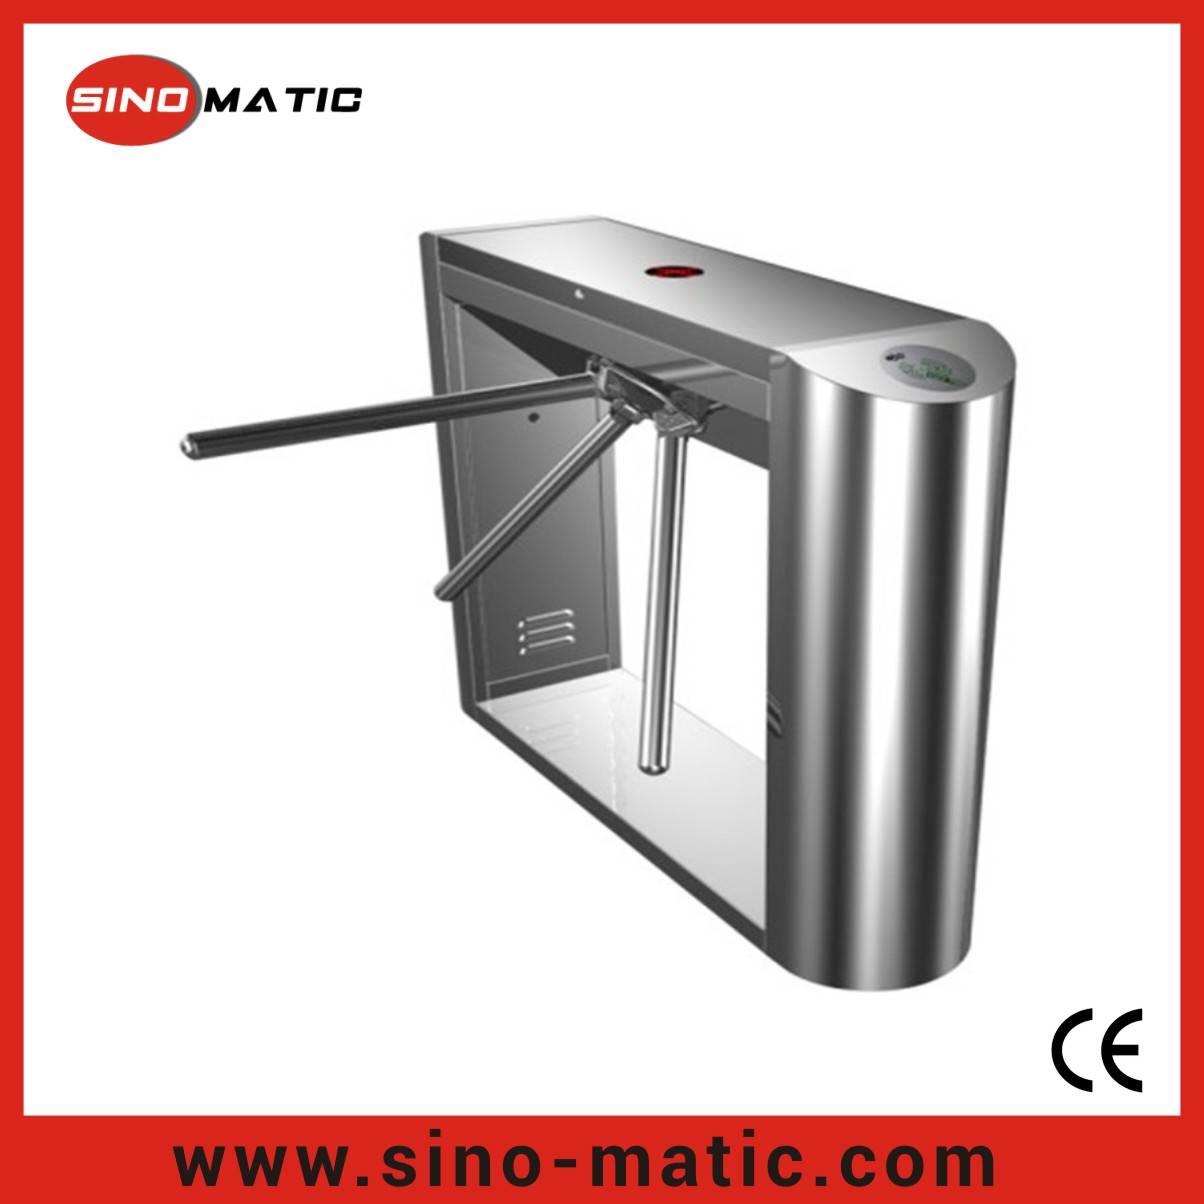 Access Control System Fingerprint Stainless Steel Tripod Turnstile